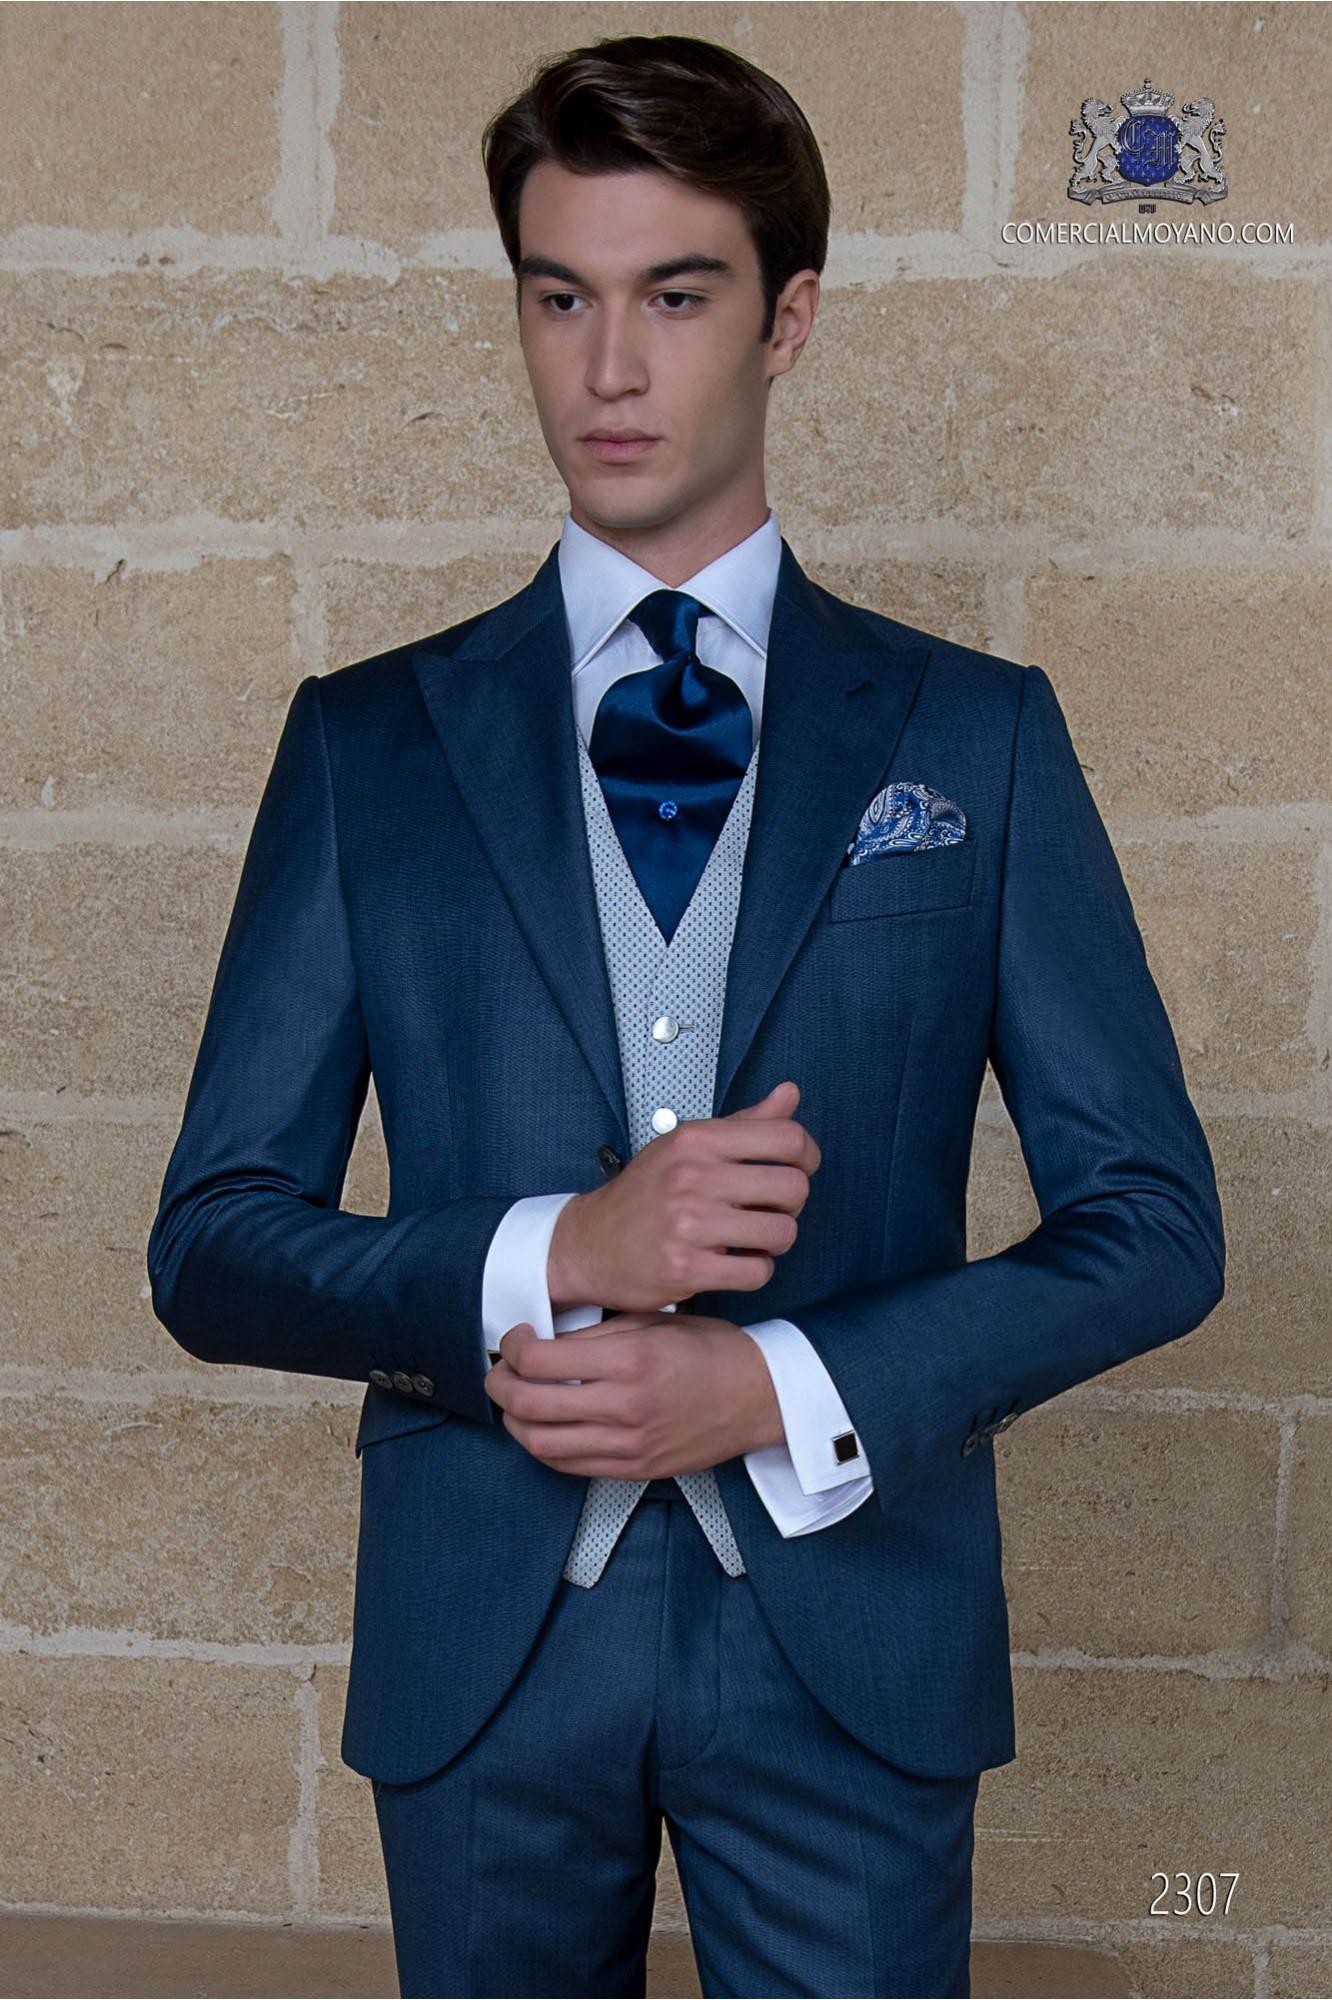 Italian blue wedding suit